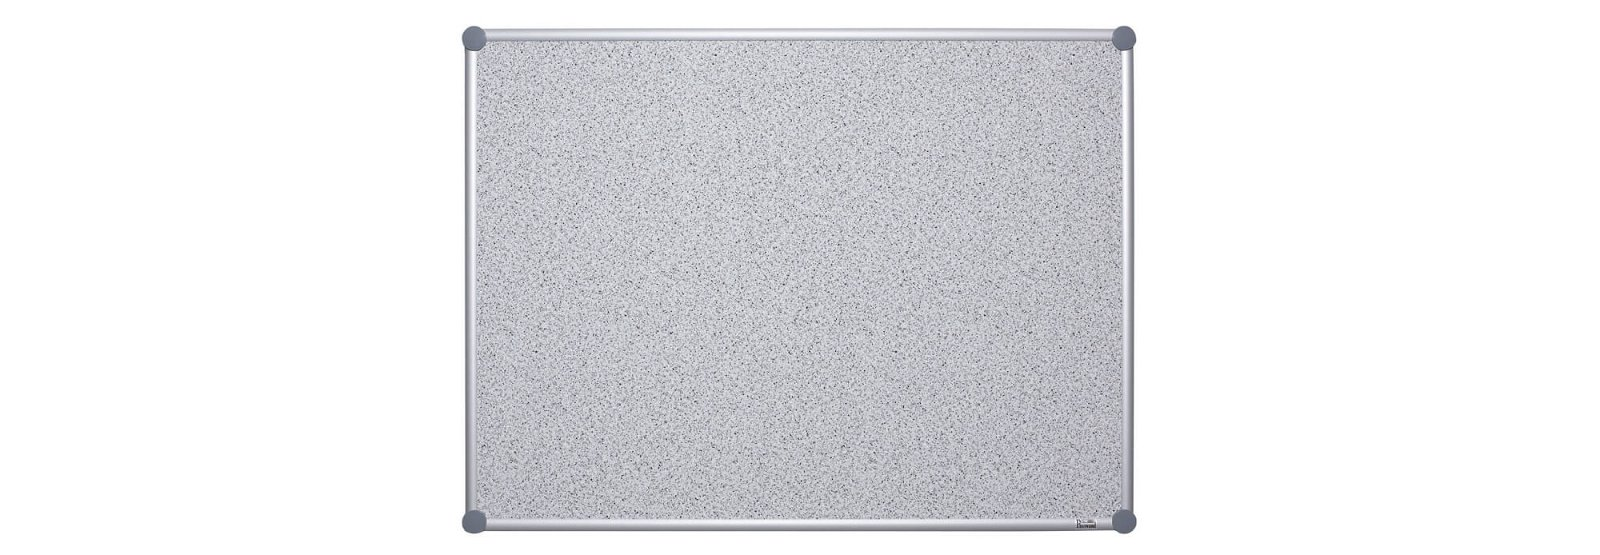 Pinnboard 2000 MAULpro, Struktur, 90x180 cm, grau